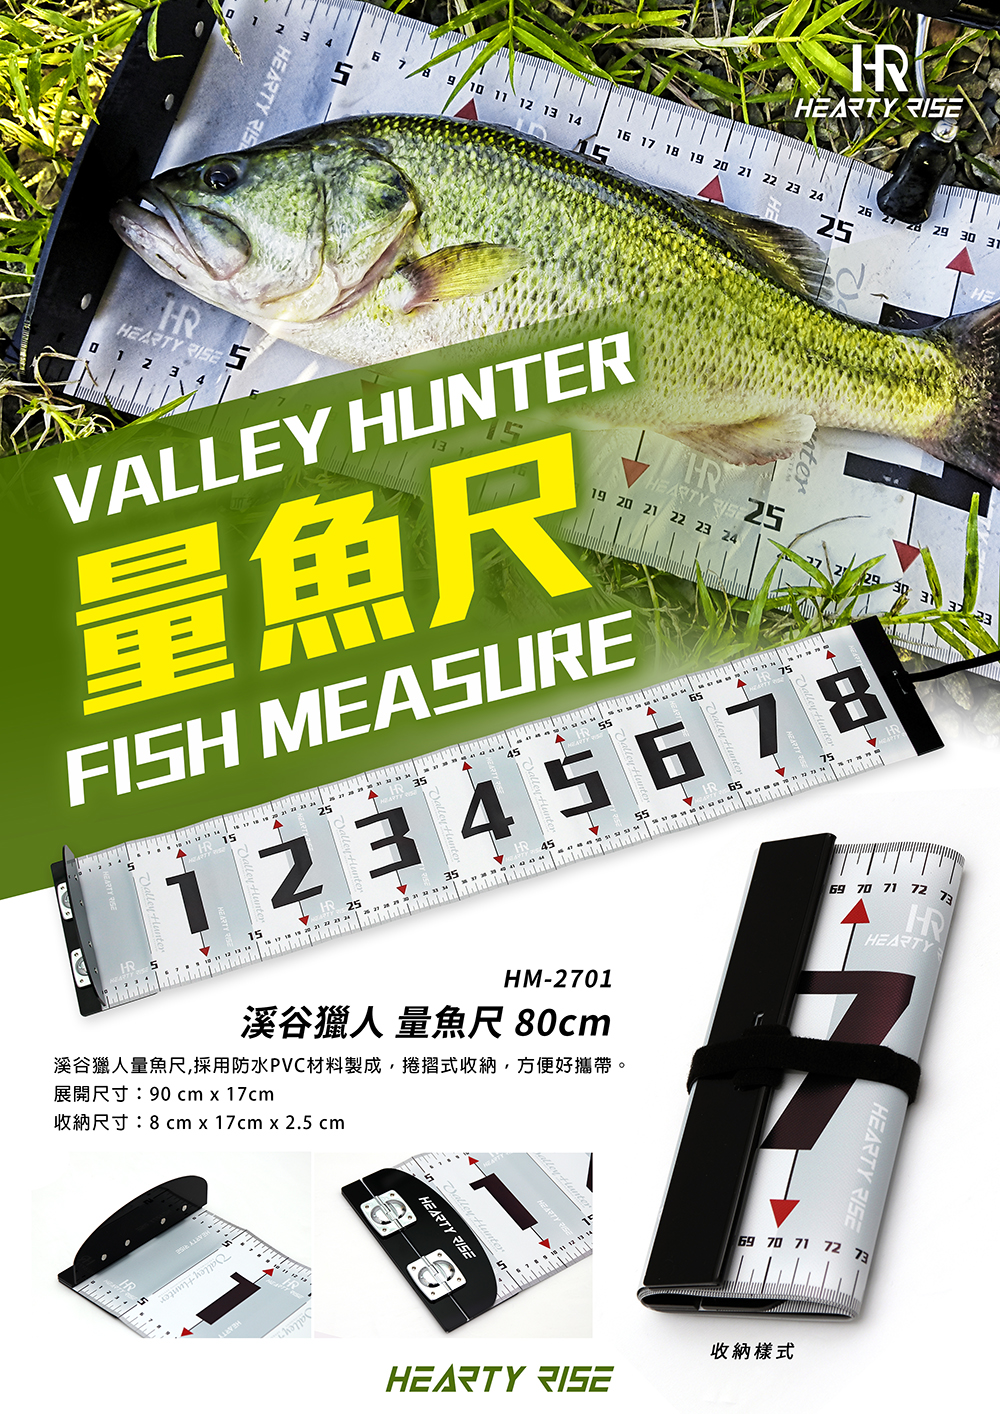 HR 溪谷獵人 量魚尺 HM-2701 1000